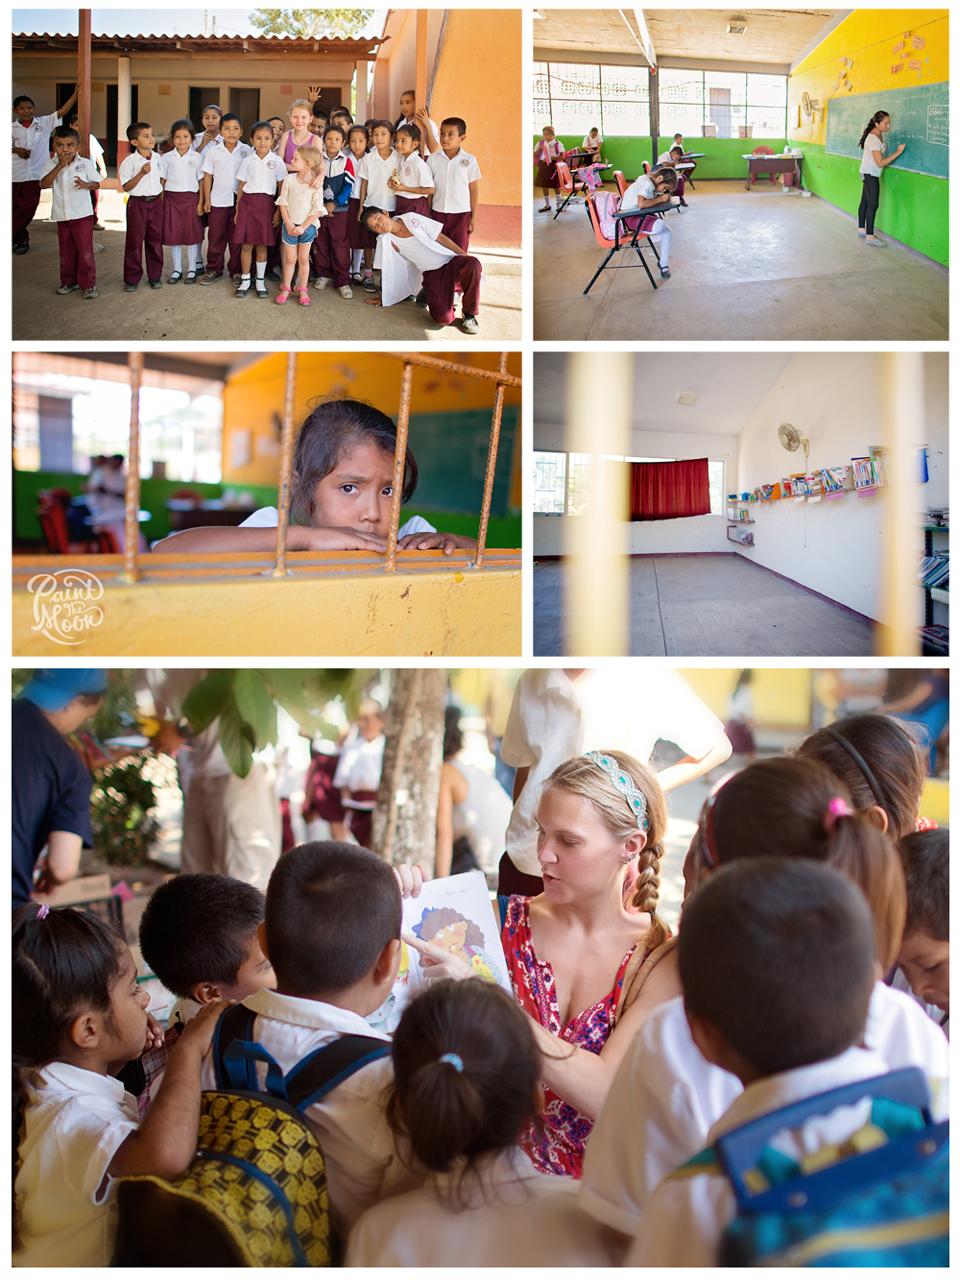 10-collage-school